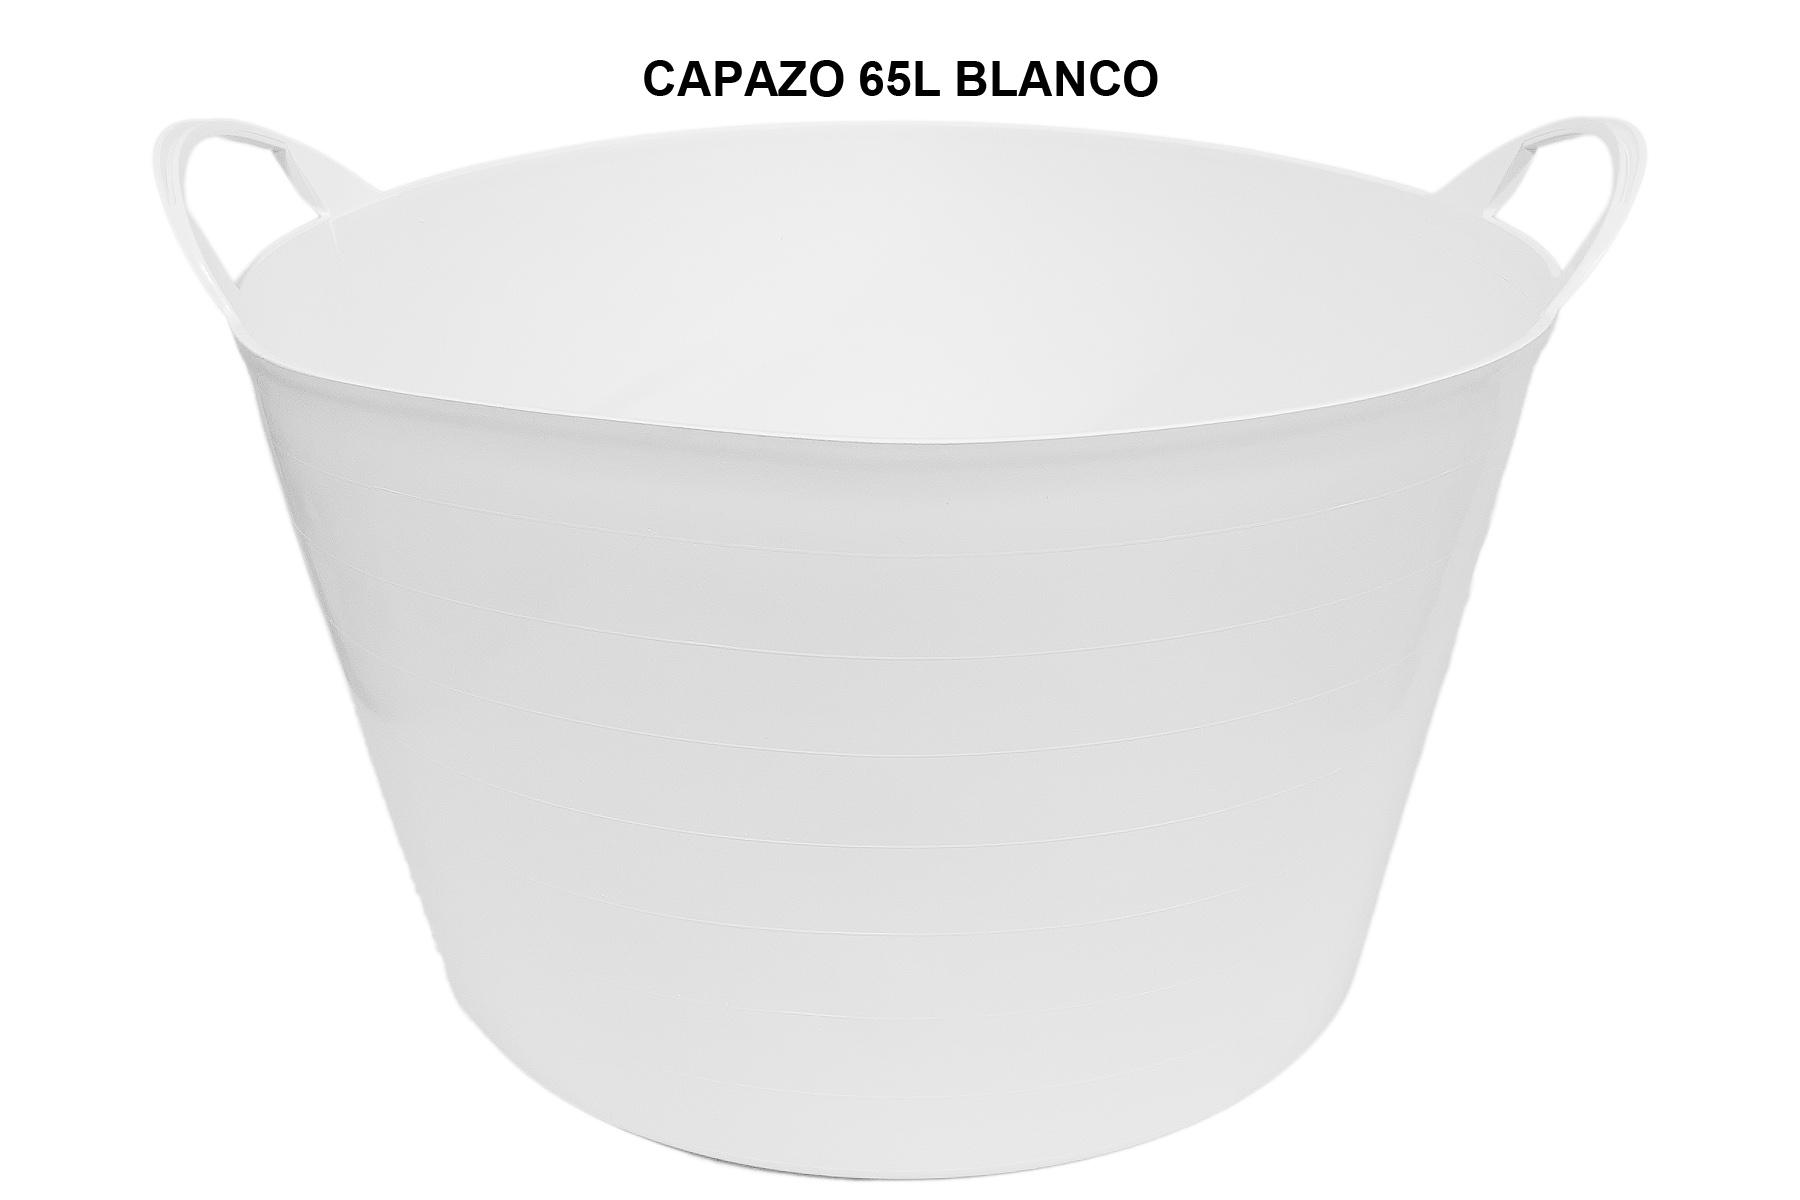 CAPAZO 65L BLANCO